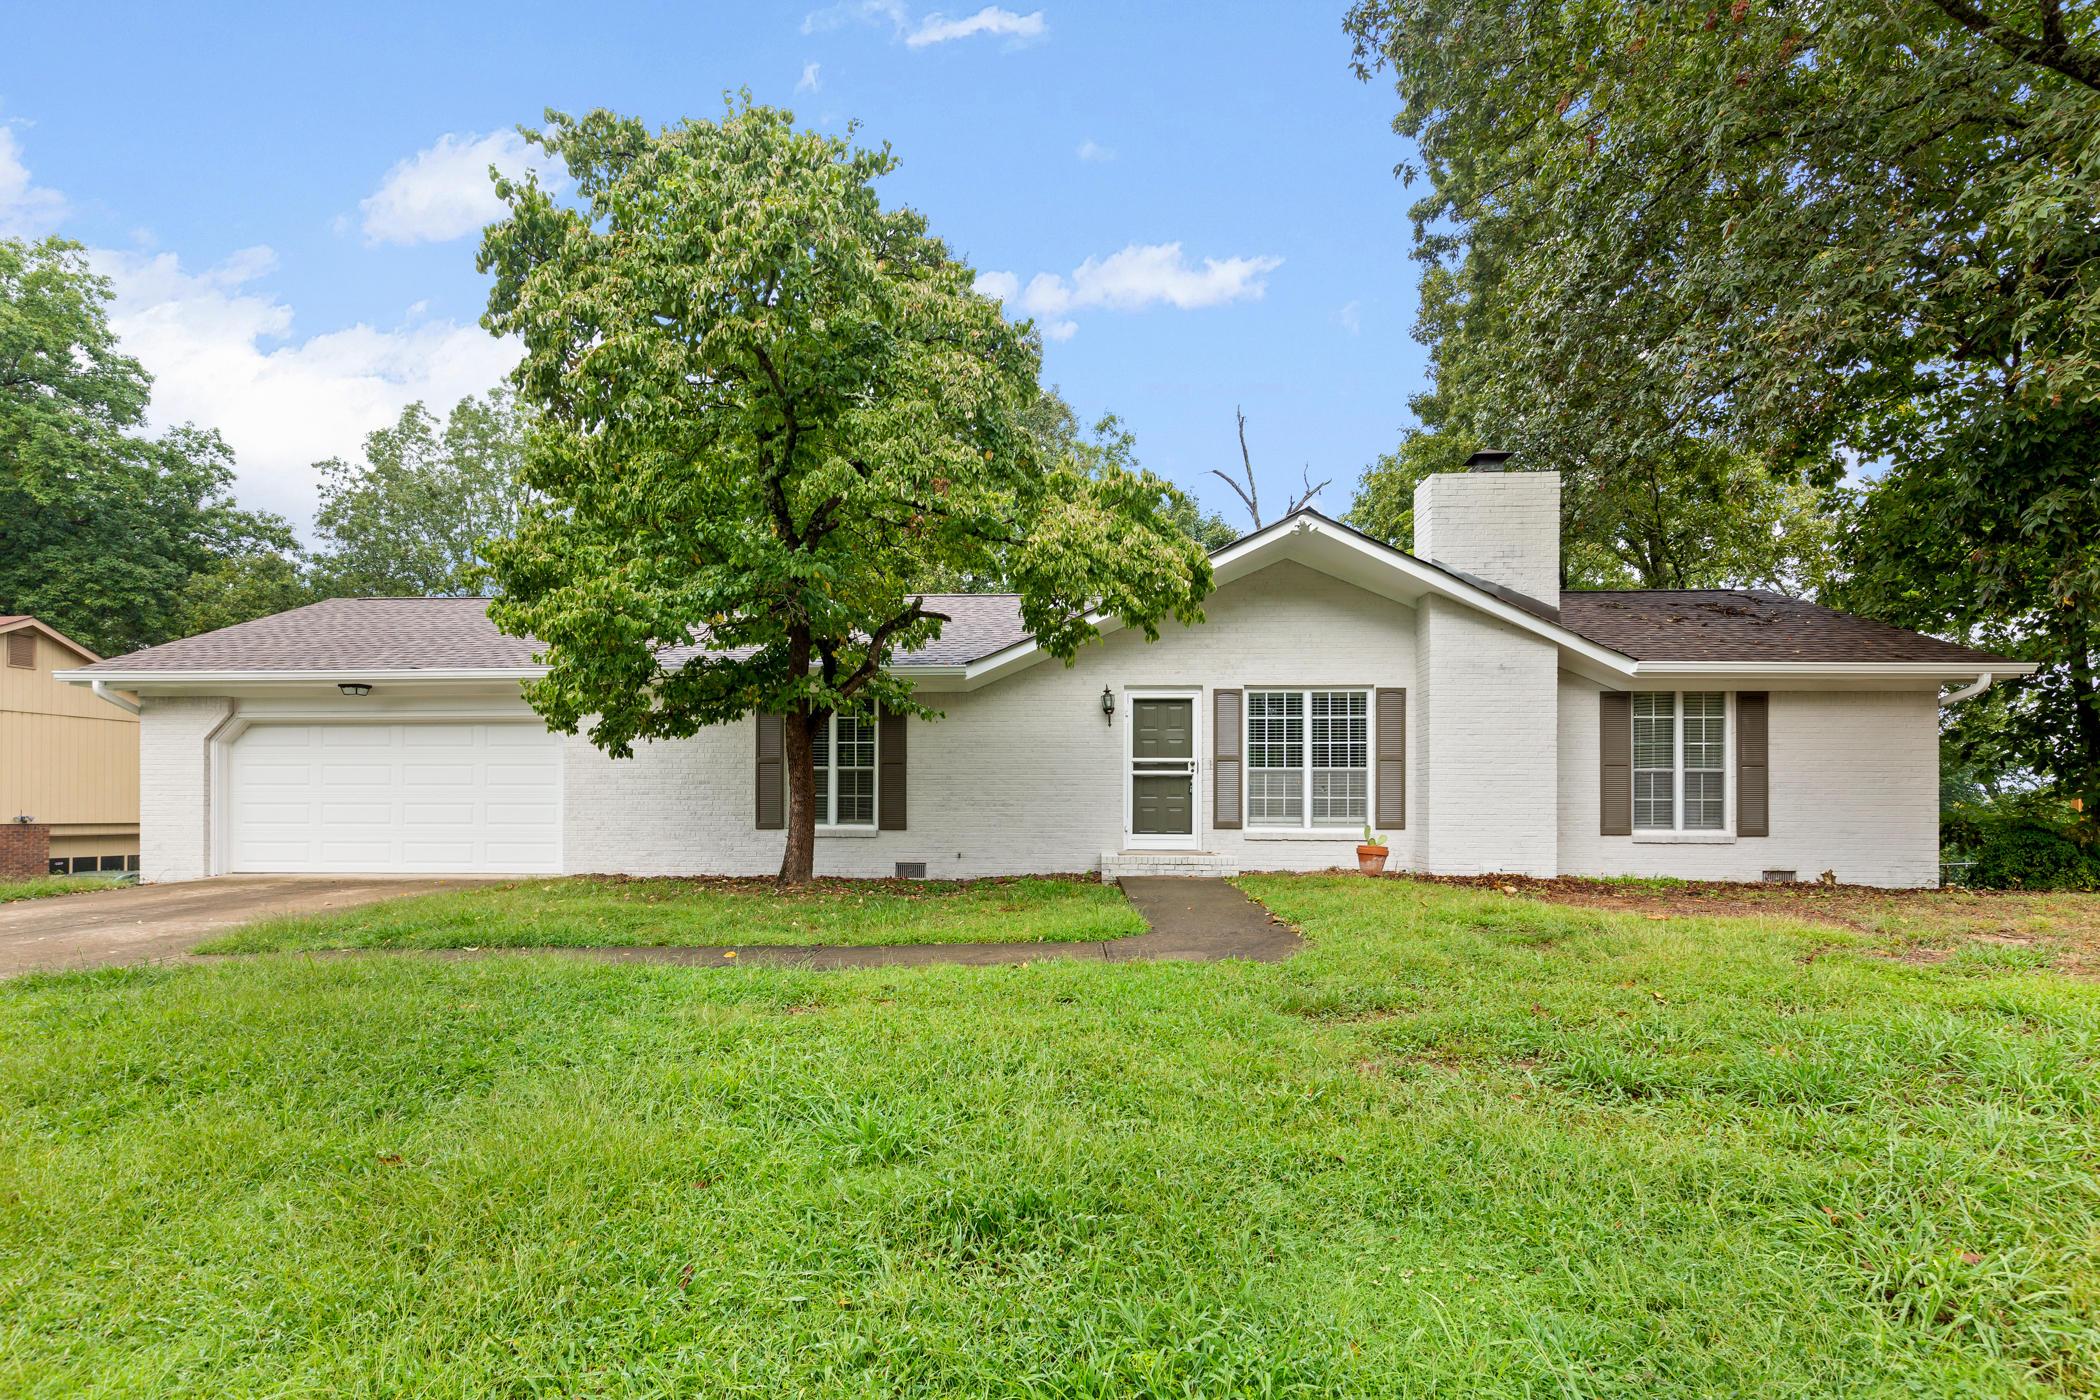 703 Swansons Ridge Rd, Chattanooga, TN 37421